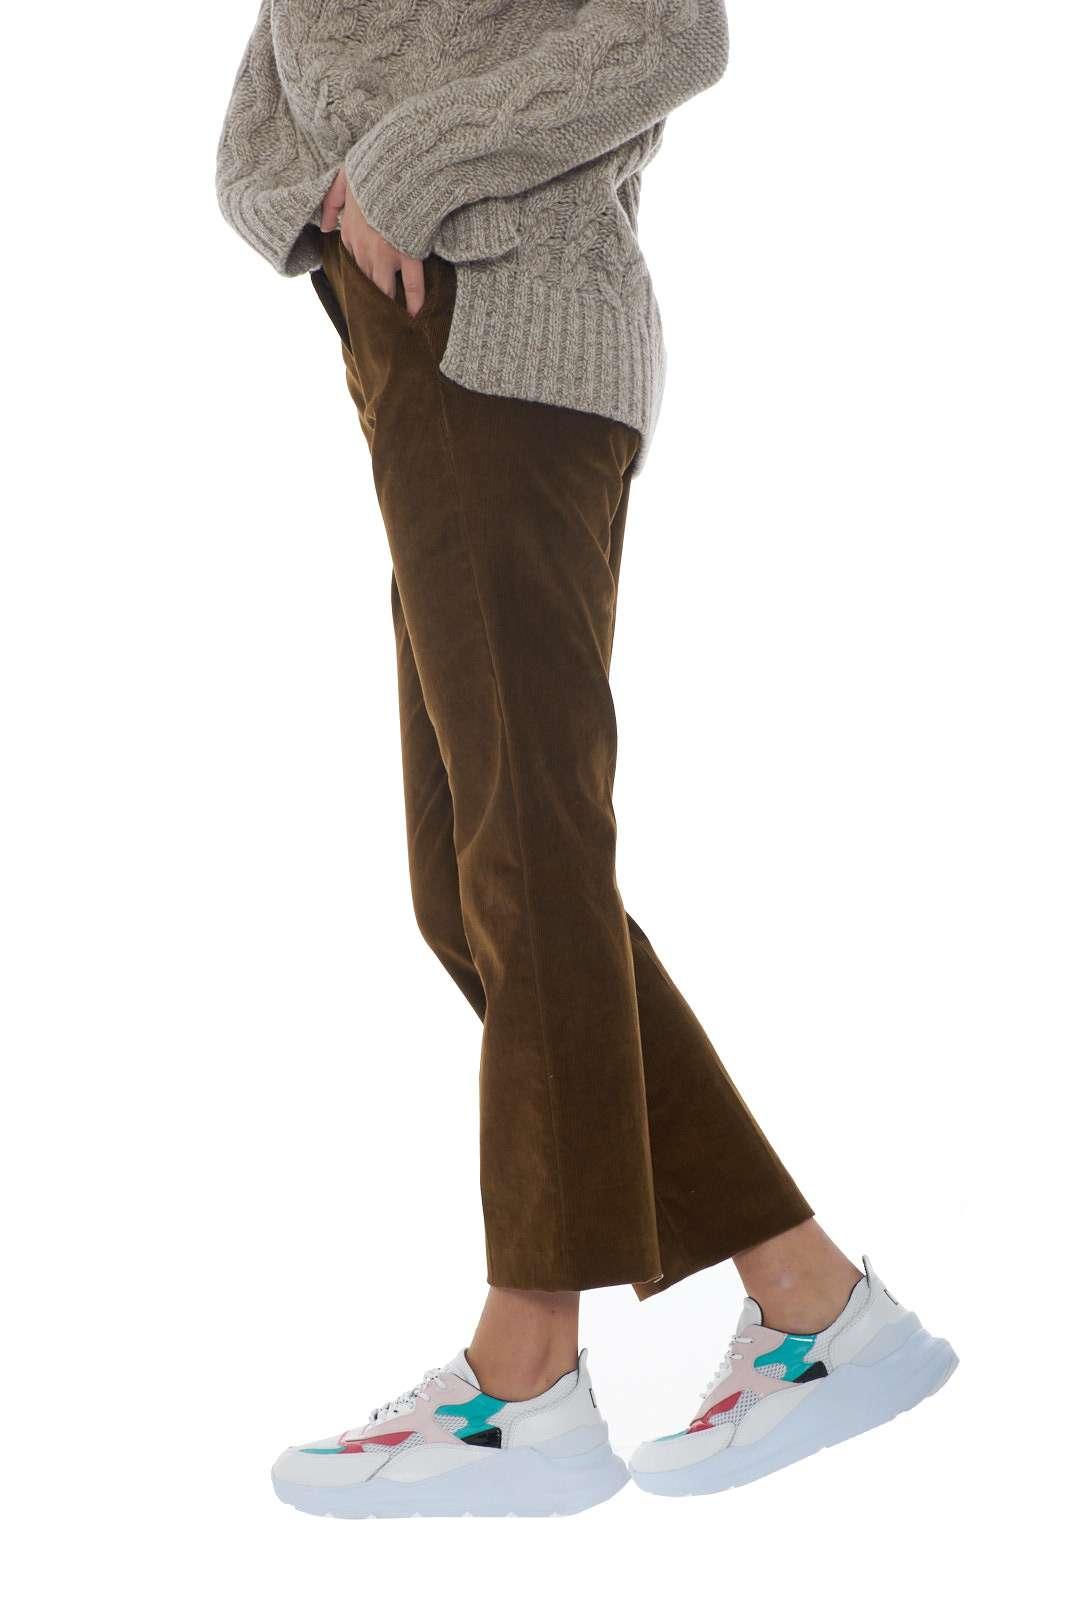 https://www.parmax.com/media/catalog/product/a/i/AI-outlet_parmax-pantaloni-donna-MaxMara-51360293-B.jpg